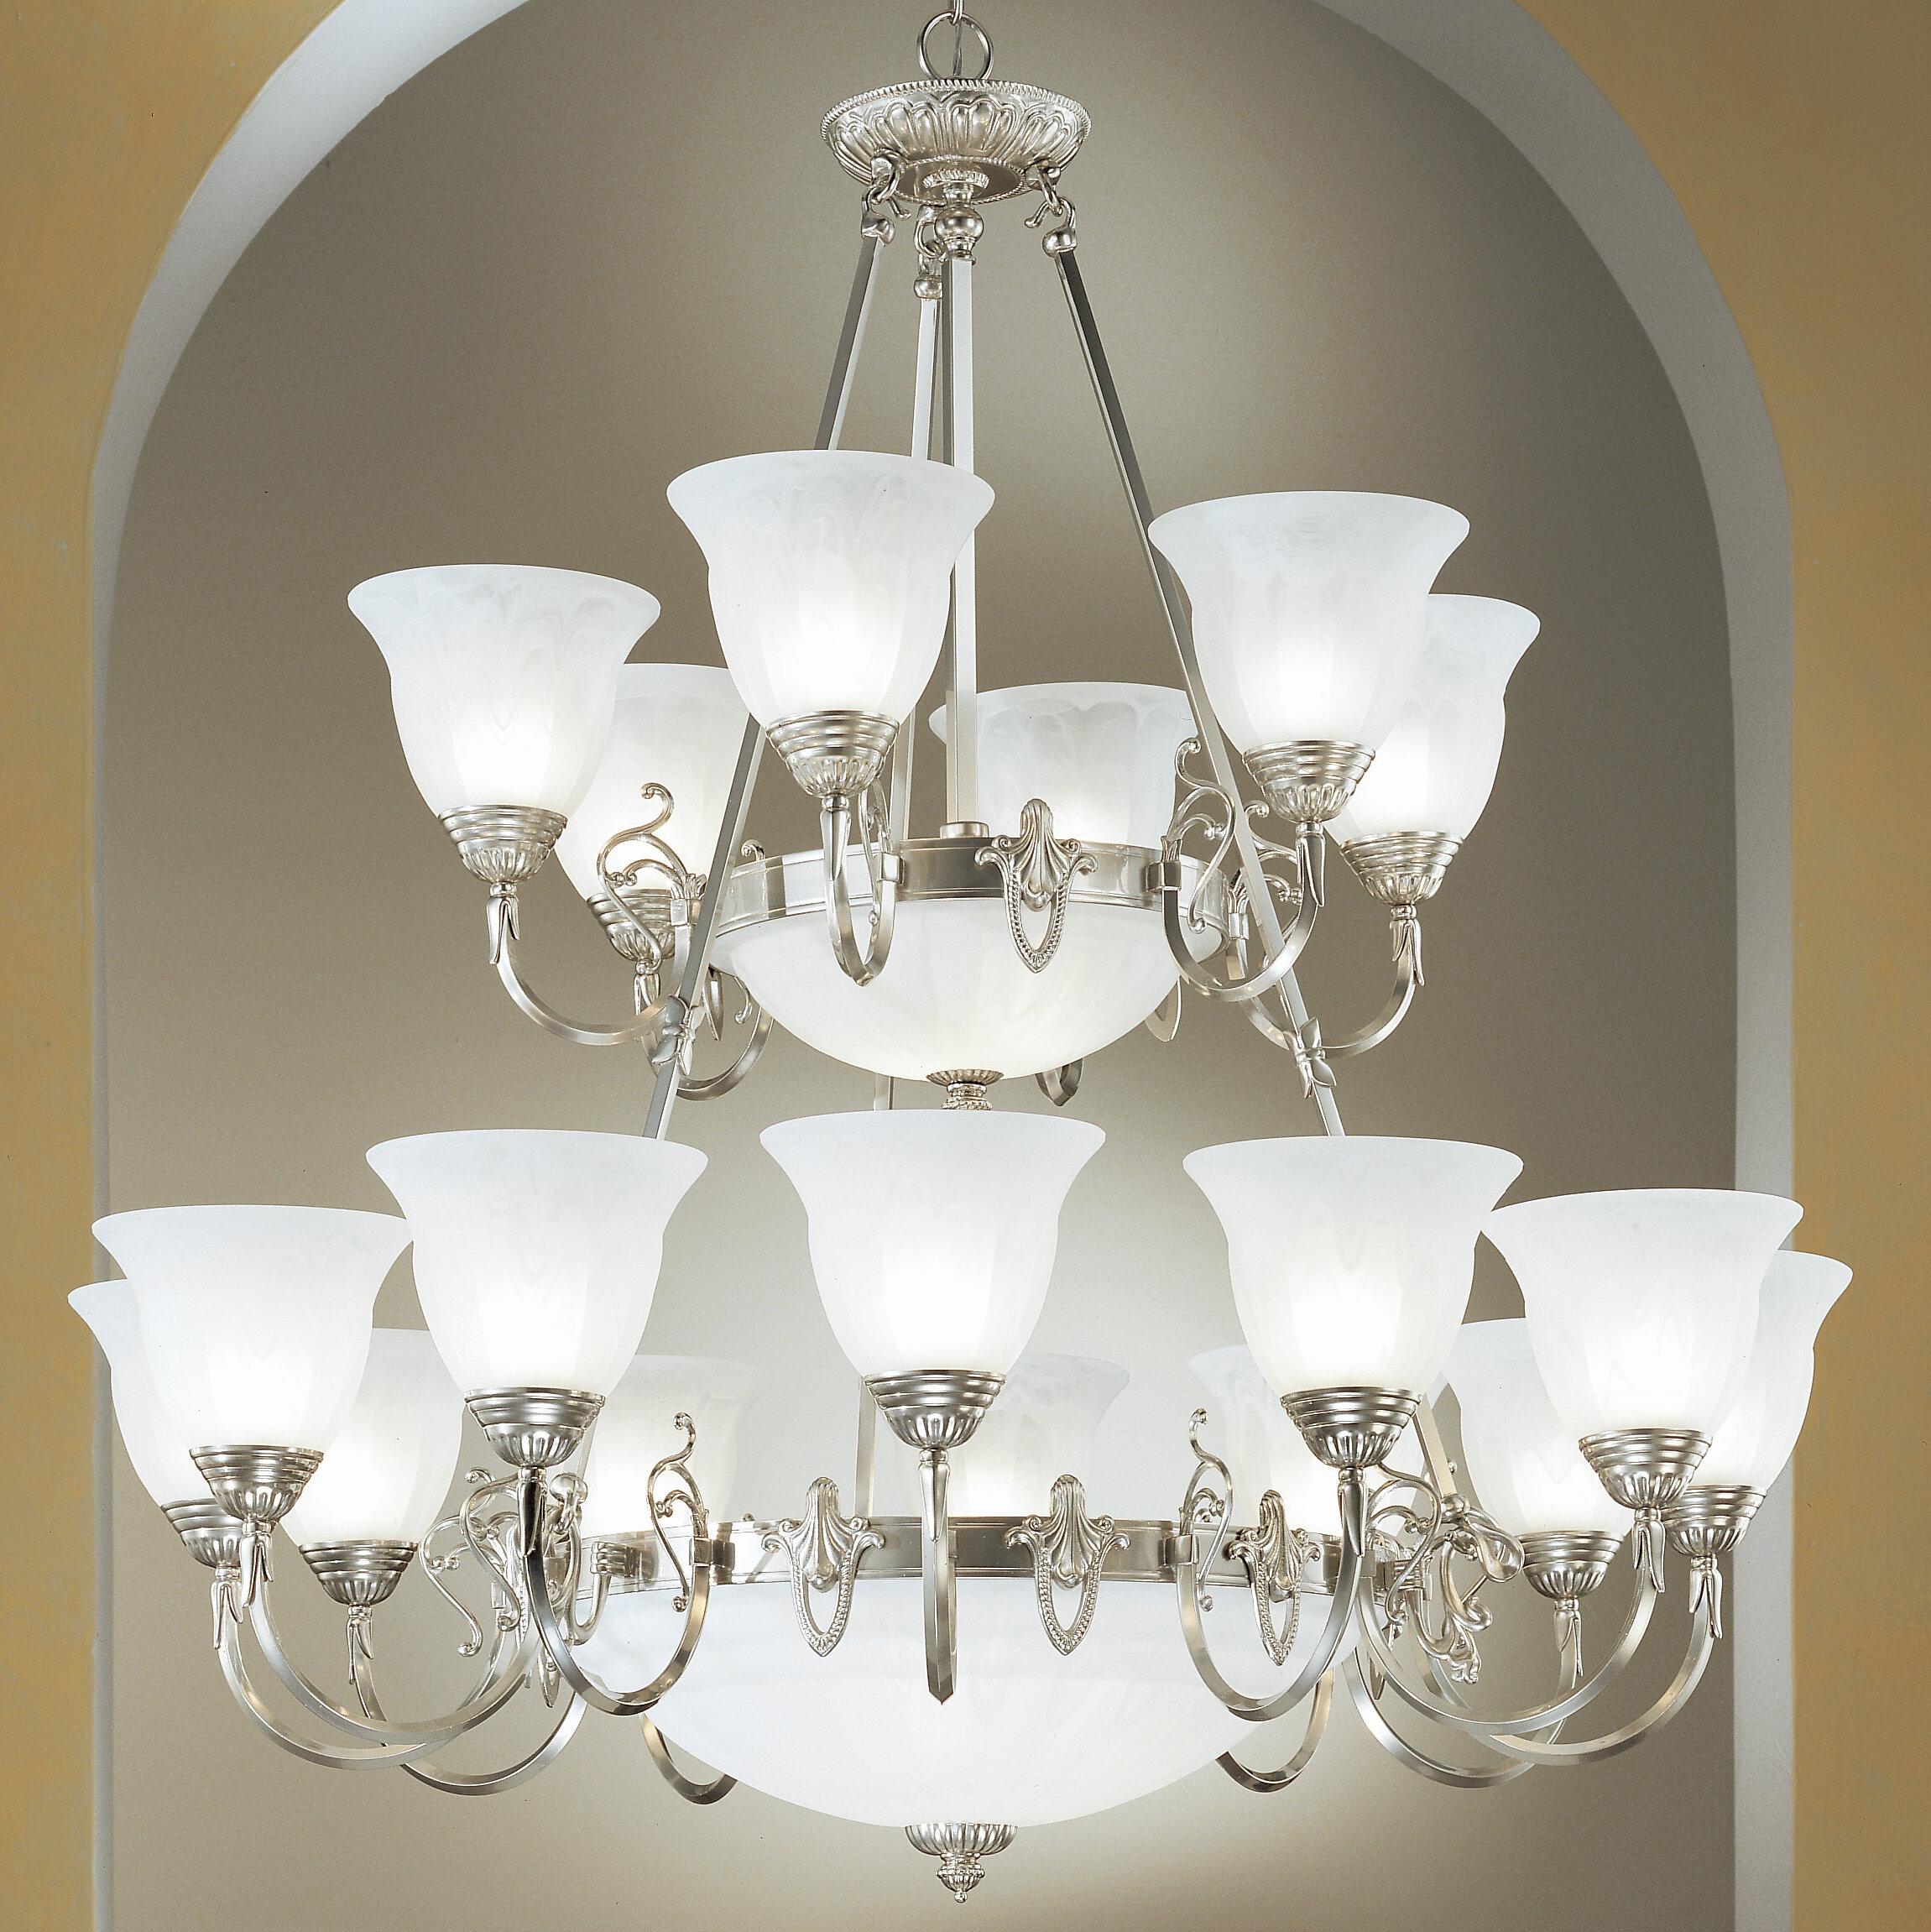 Classic Lighting Yorkshire Ii 24 Light Shaded Tiered Chandelier Wayfair Ca